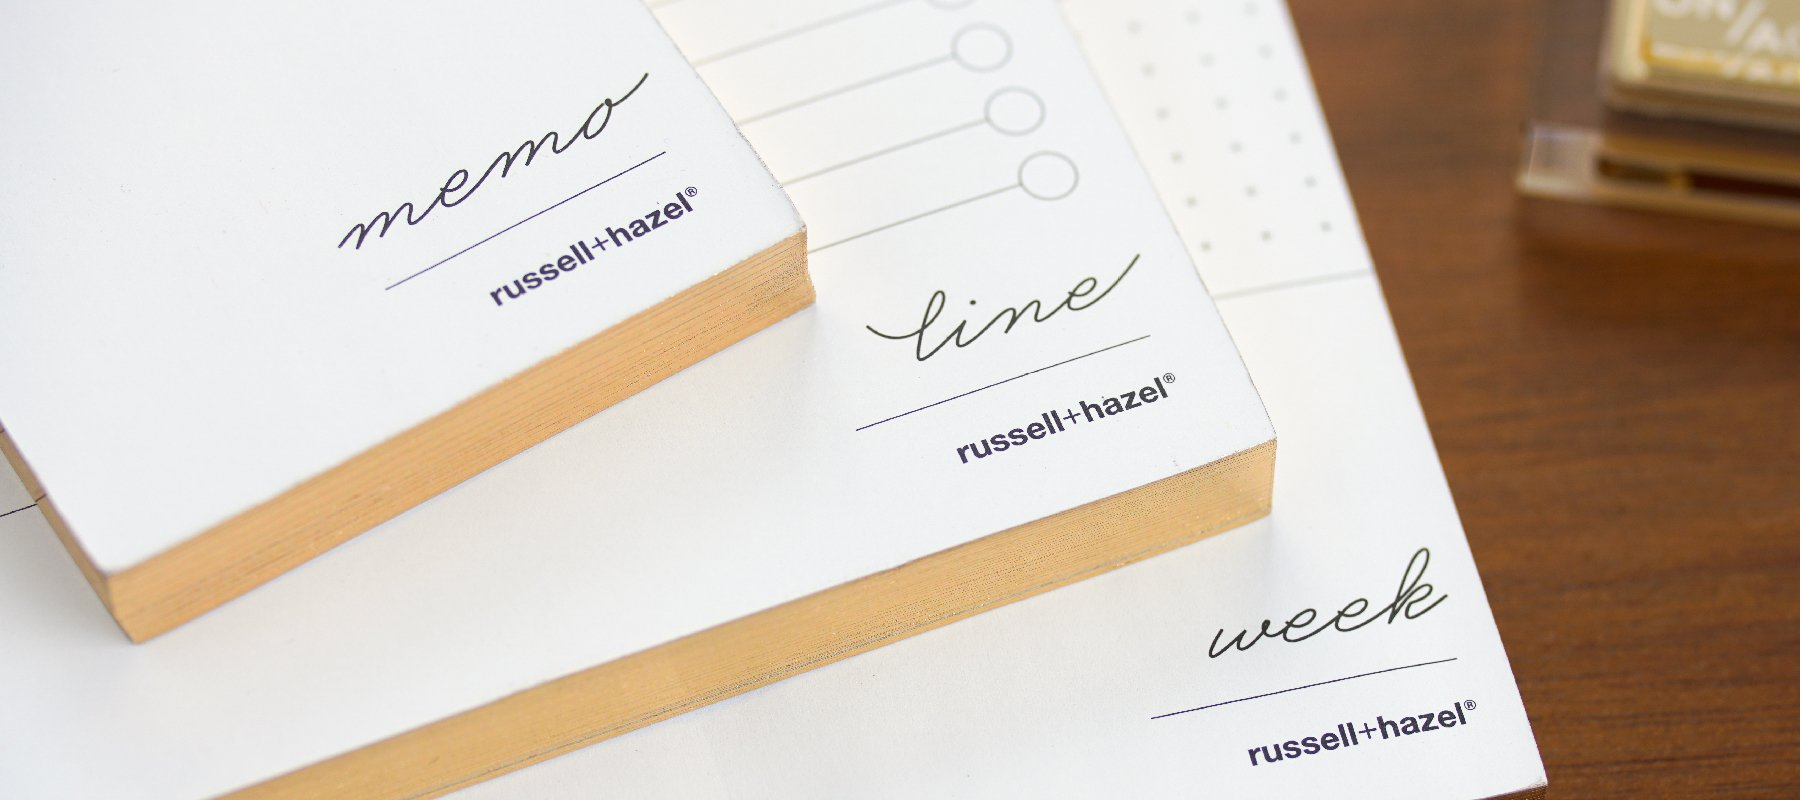 Undated Planners - russell+hazel